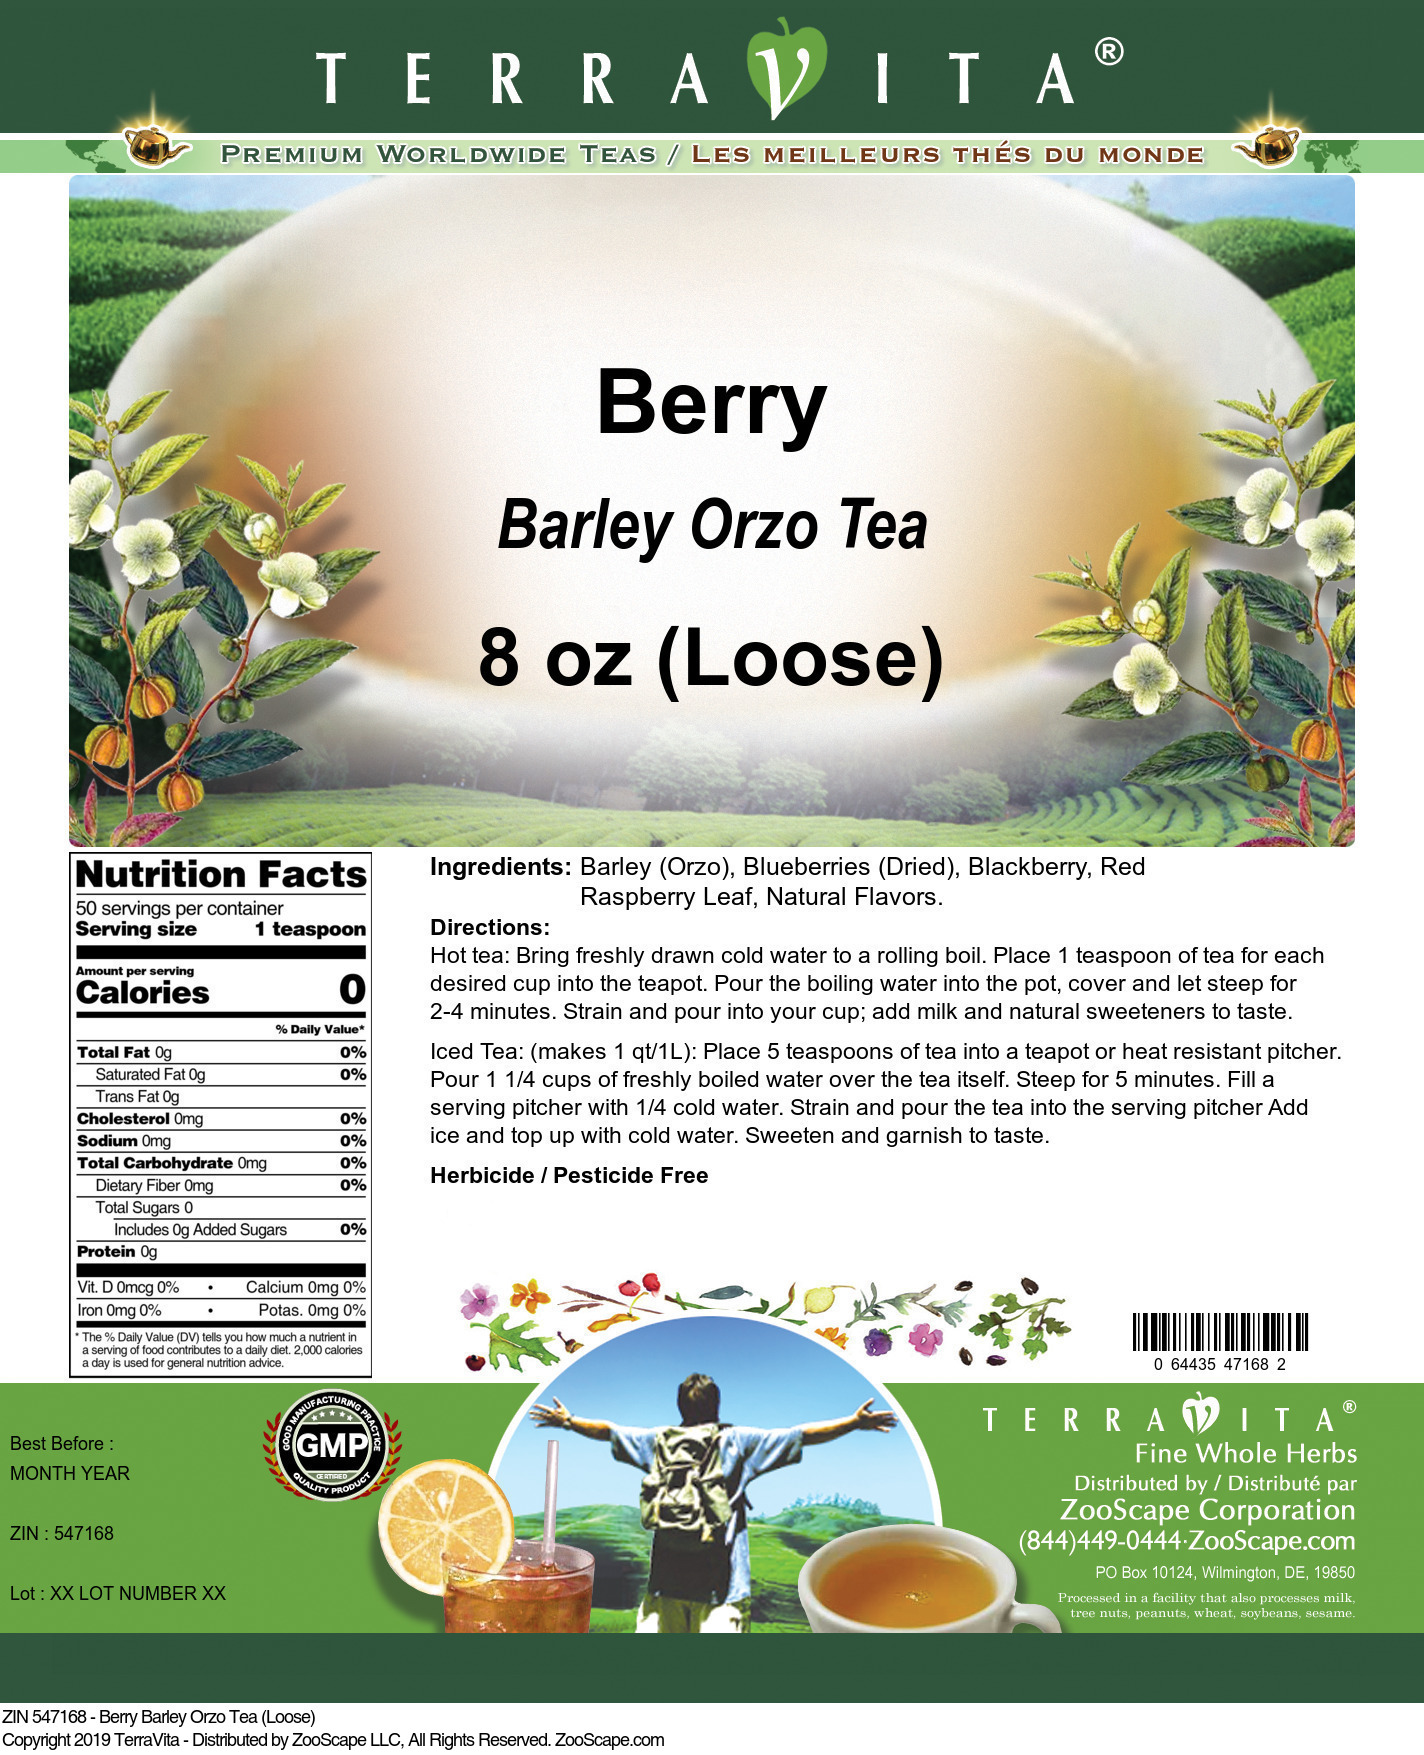 Berry Barley Orzo Tea (Loose)